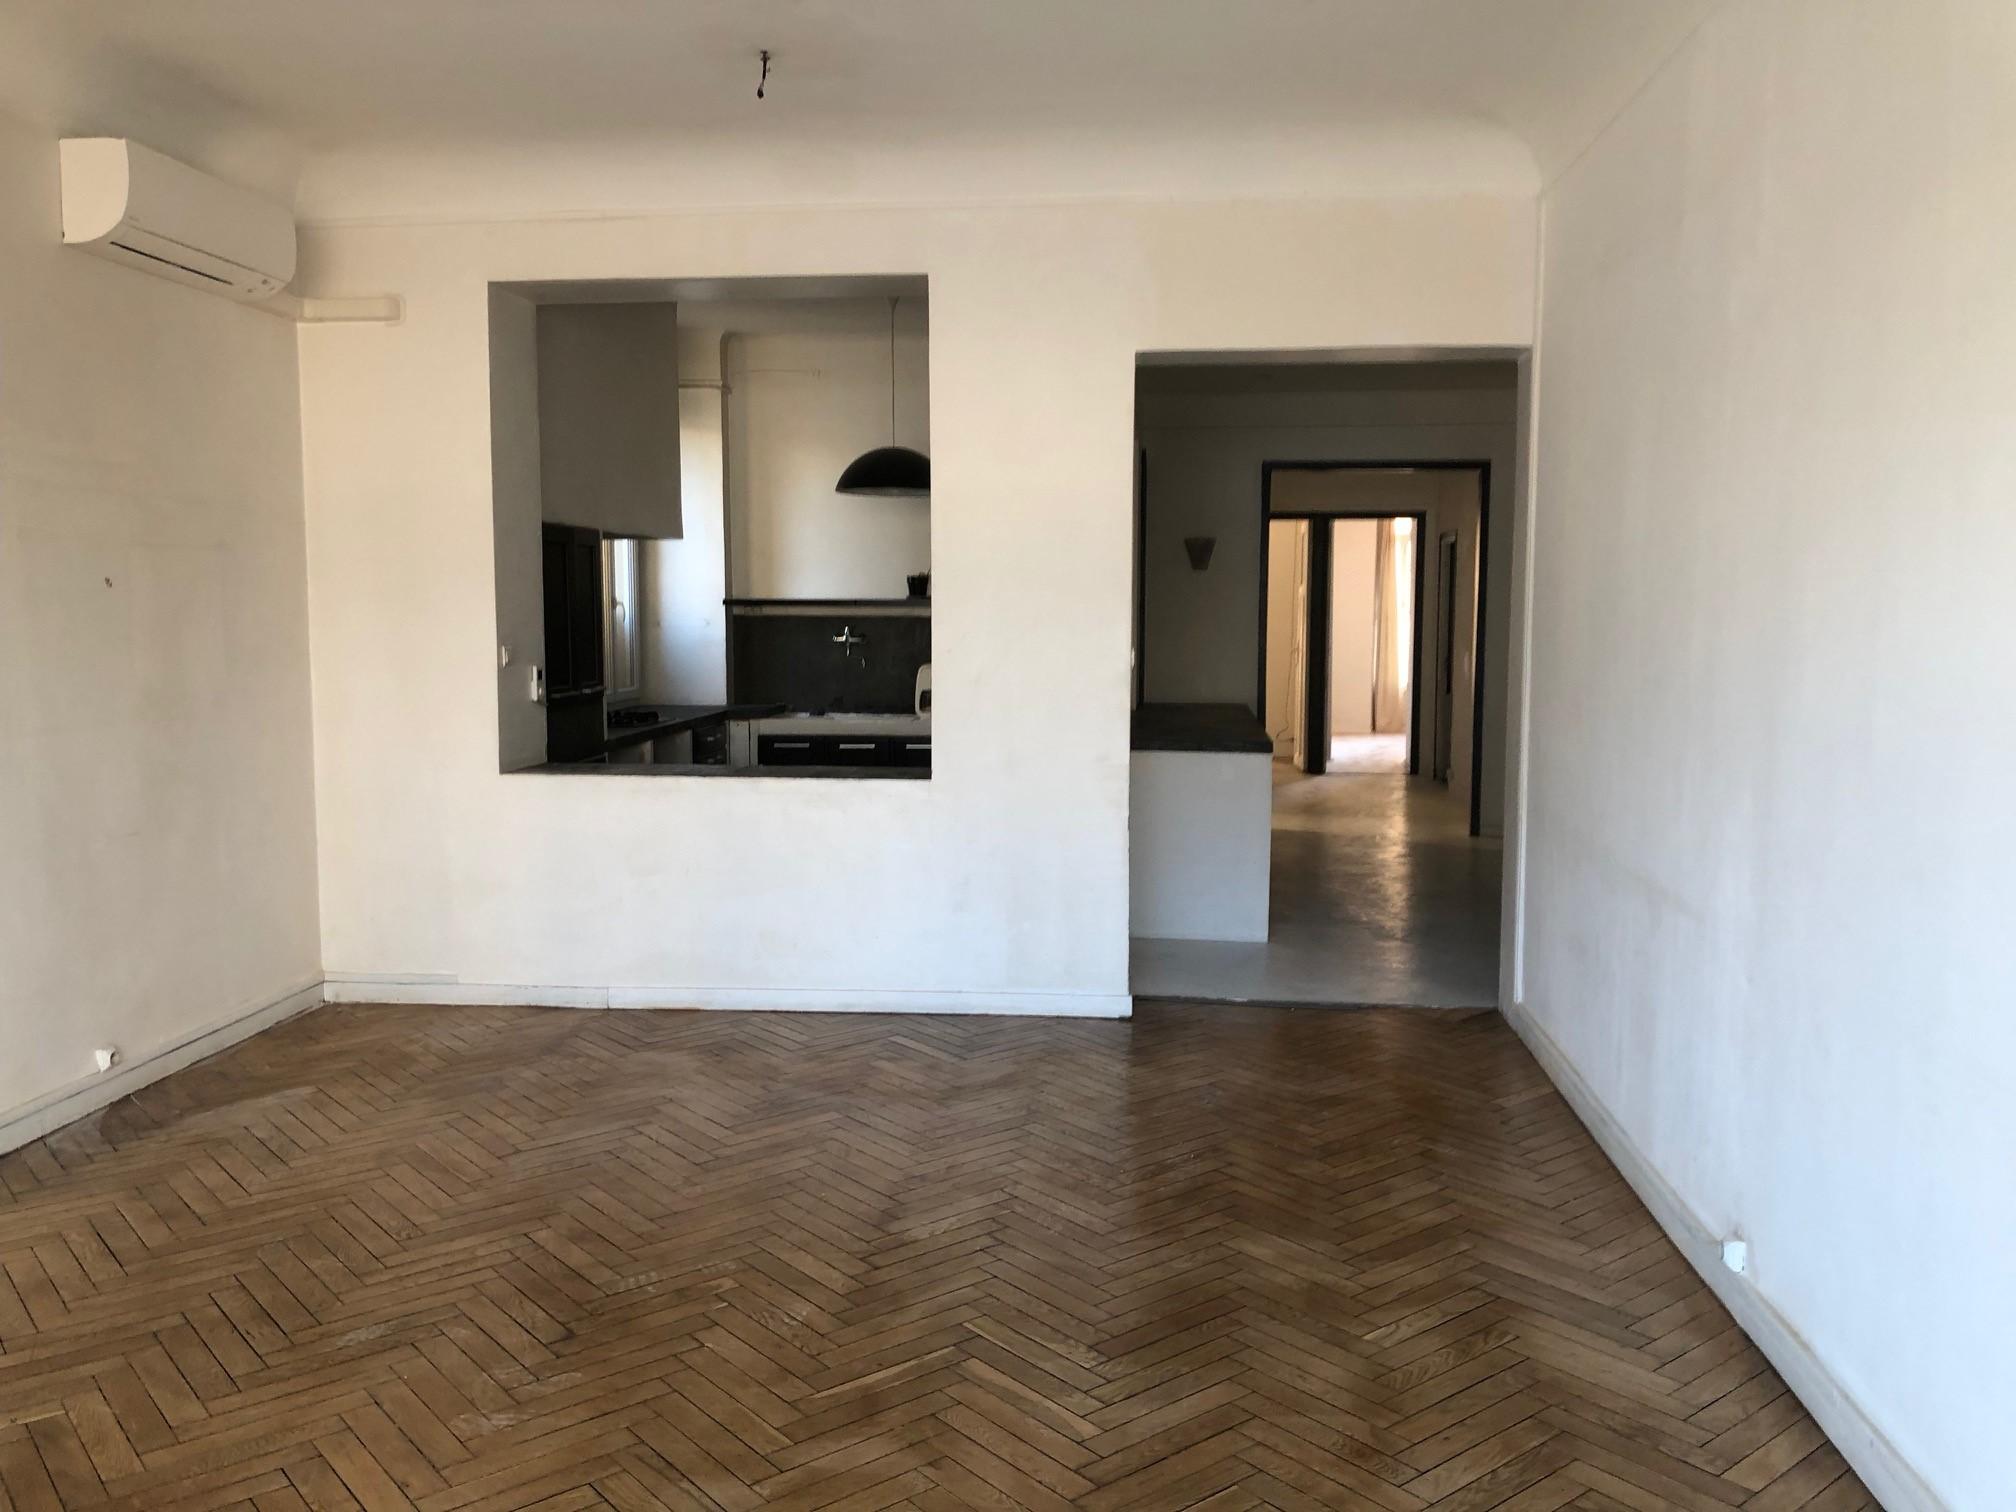 Location bureau/appartement Avenue du Prado Marseille 8ème